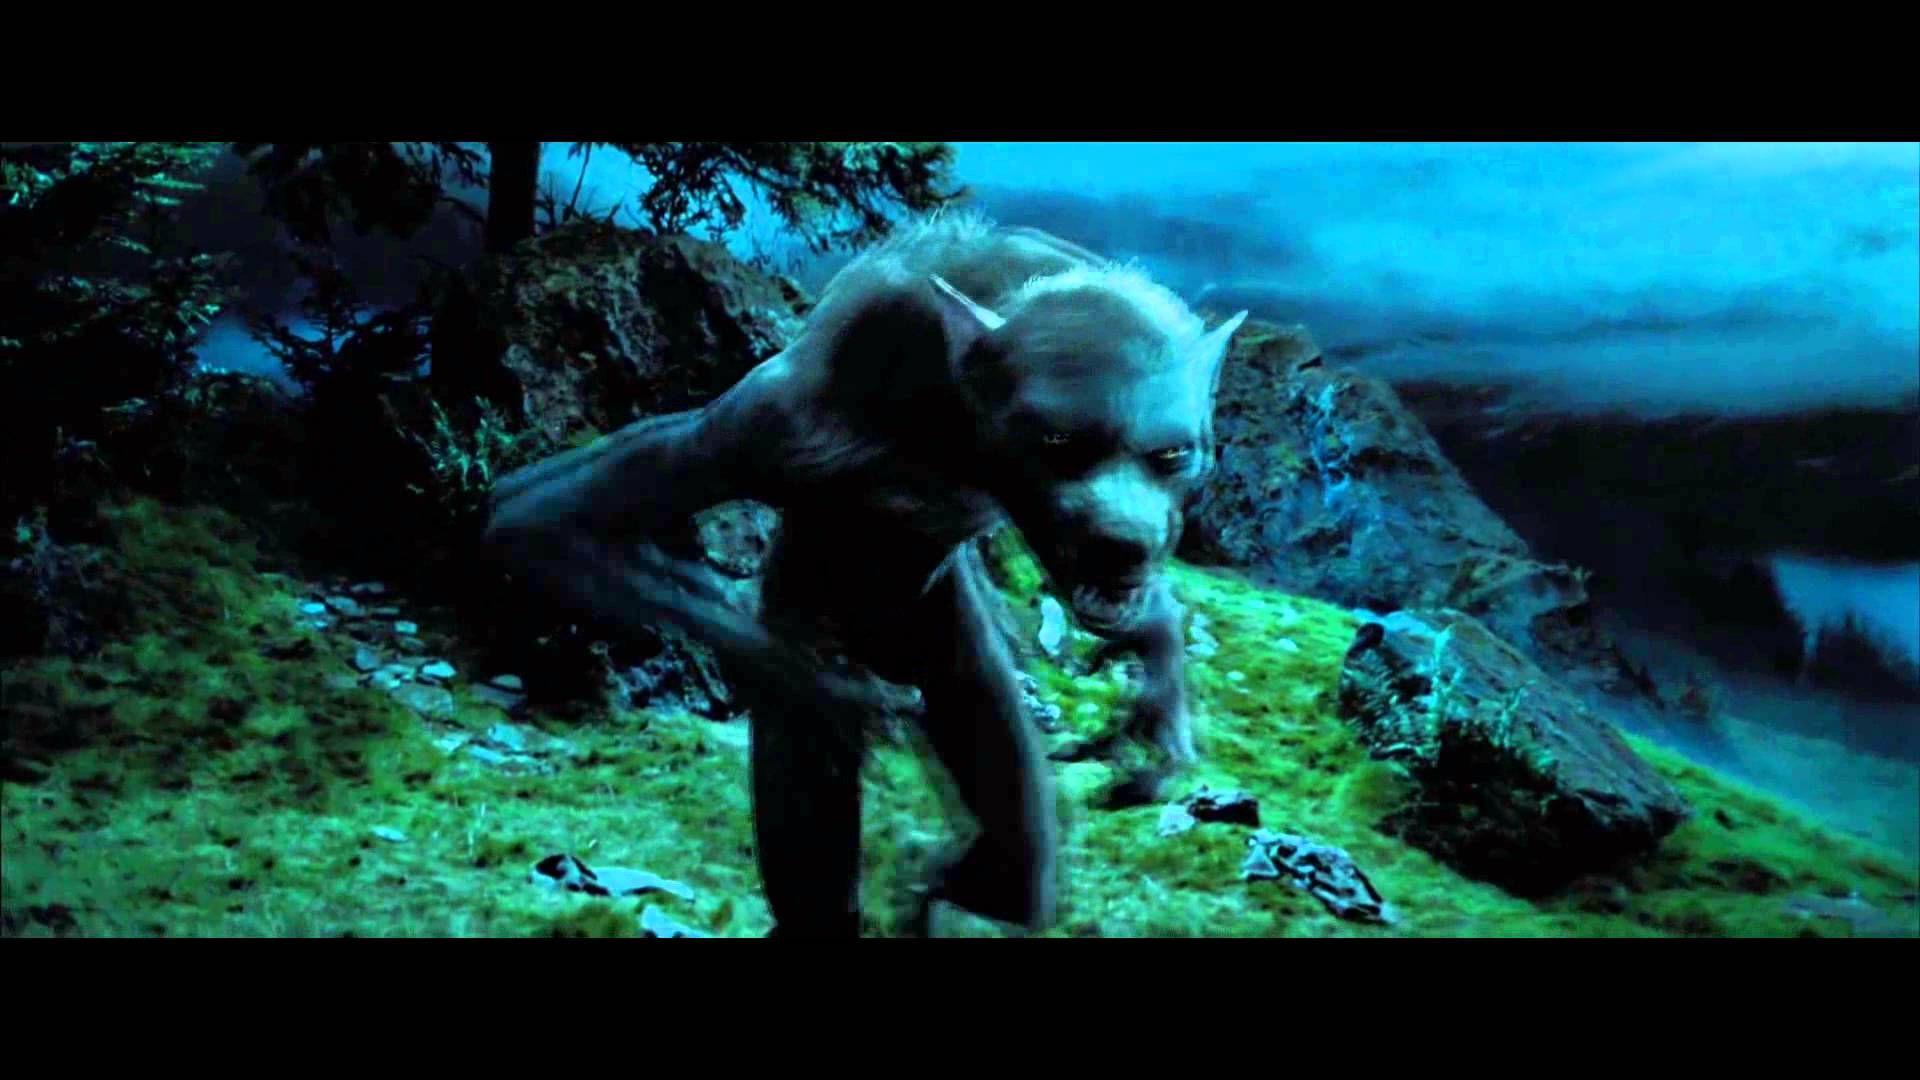 Lupin Turns Into Werewolf Hd Prisoner Of Azkaban Azkaban Werewolf